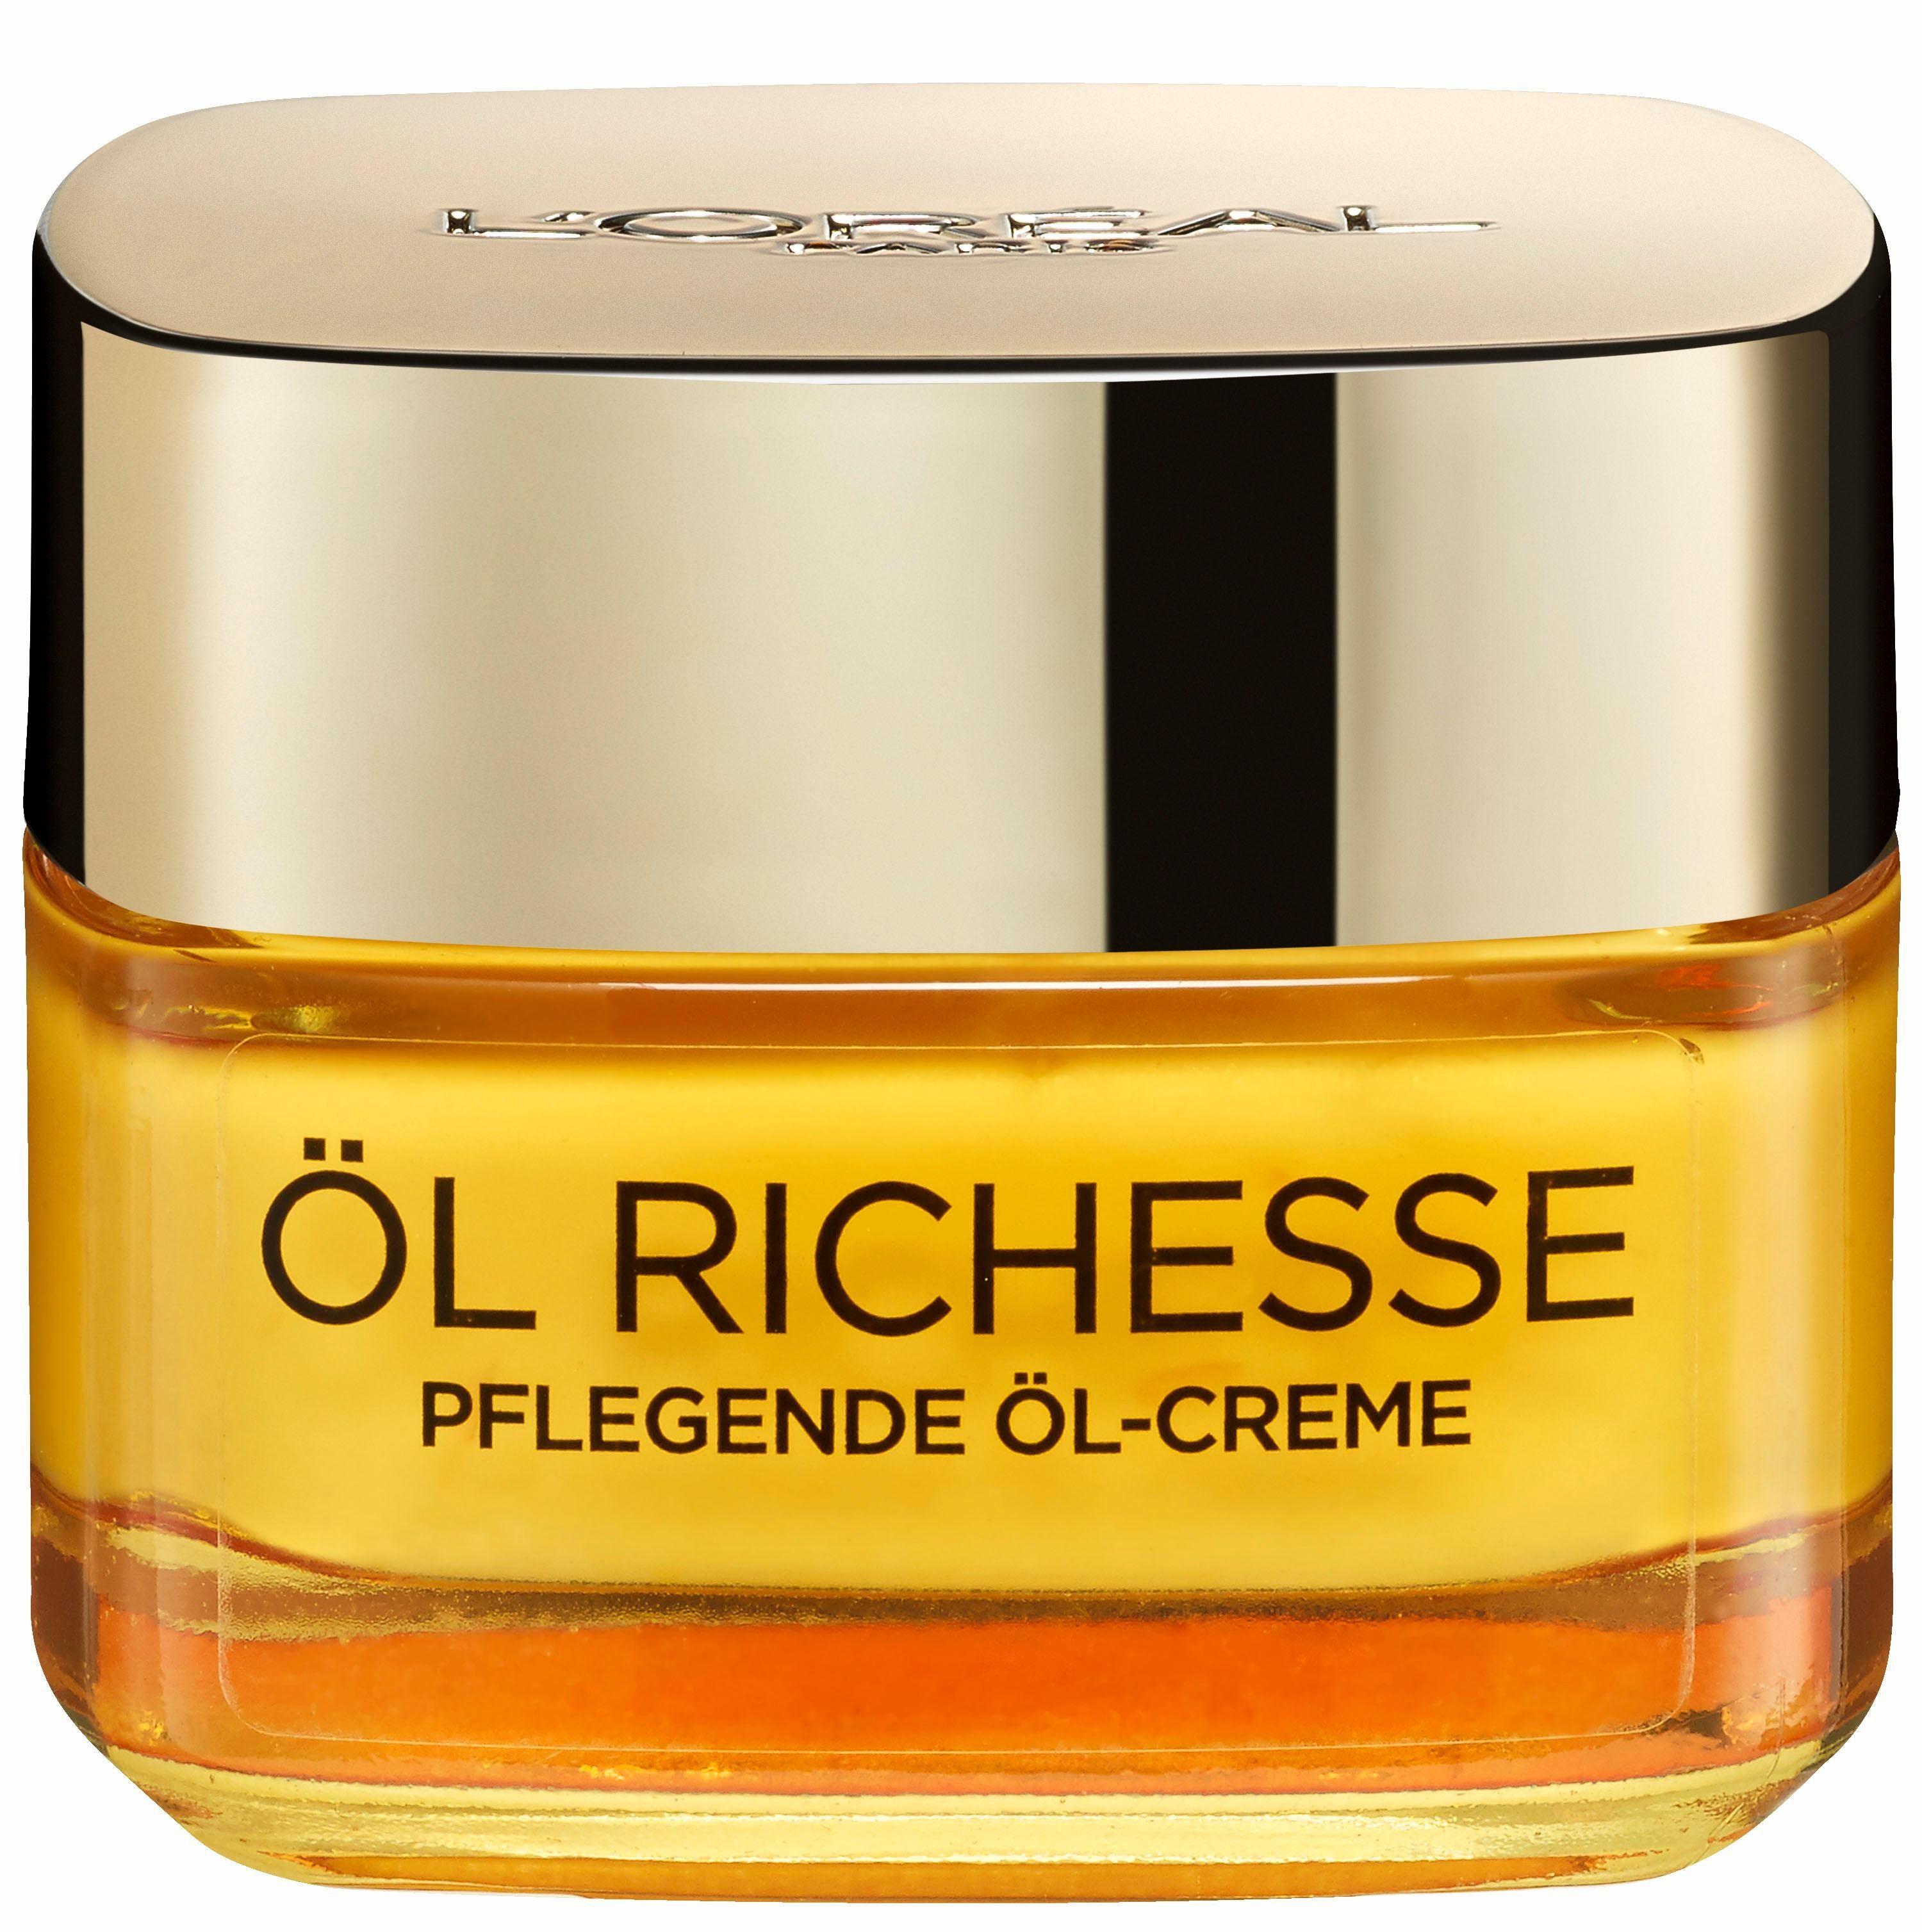 L'Oreal Paris, »Öl Richesse«, Pflegende Öl-Creme